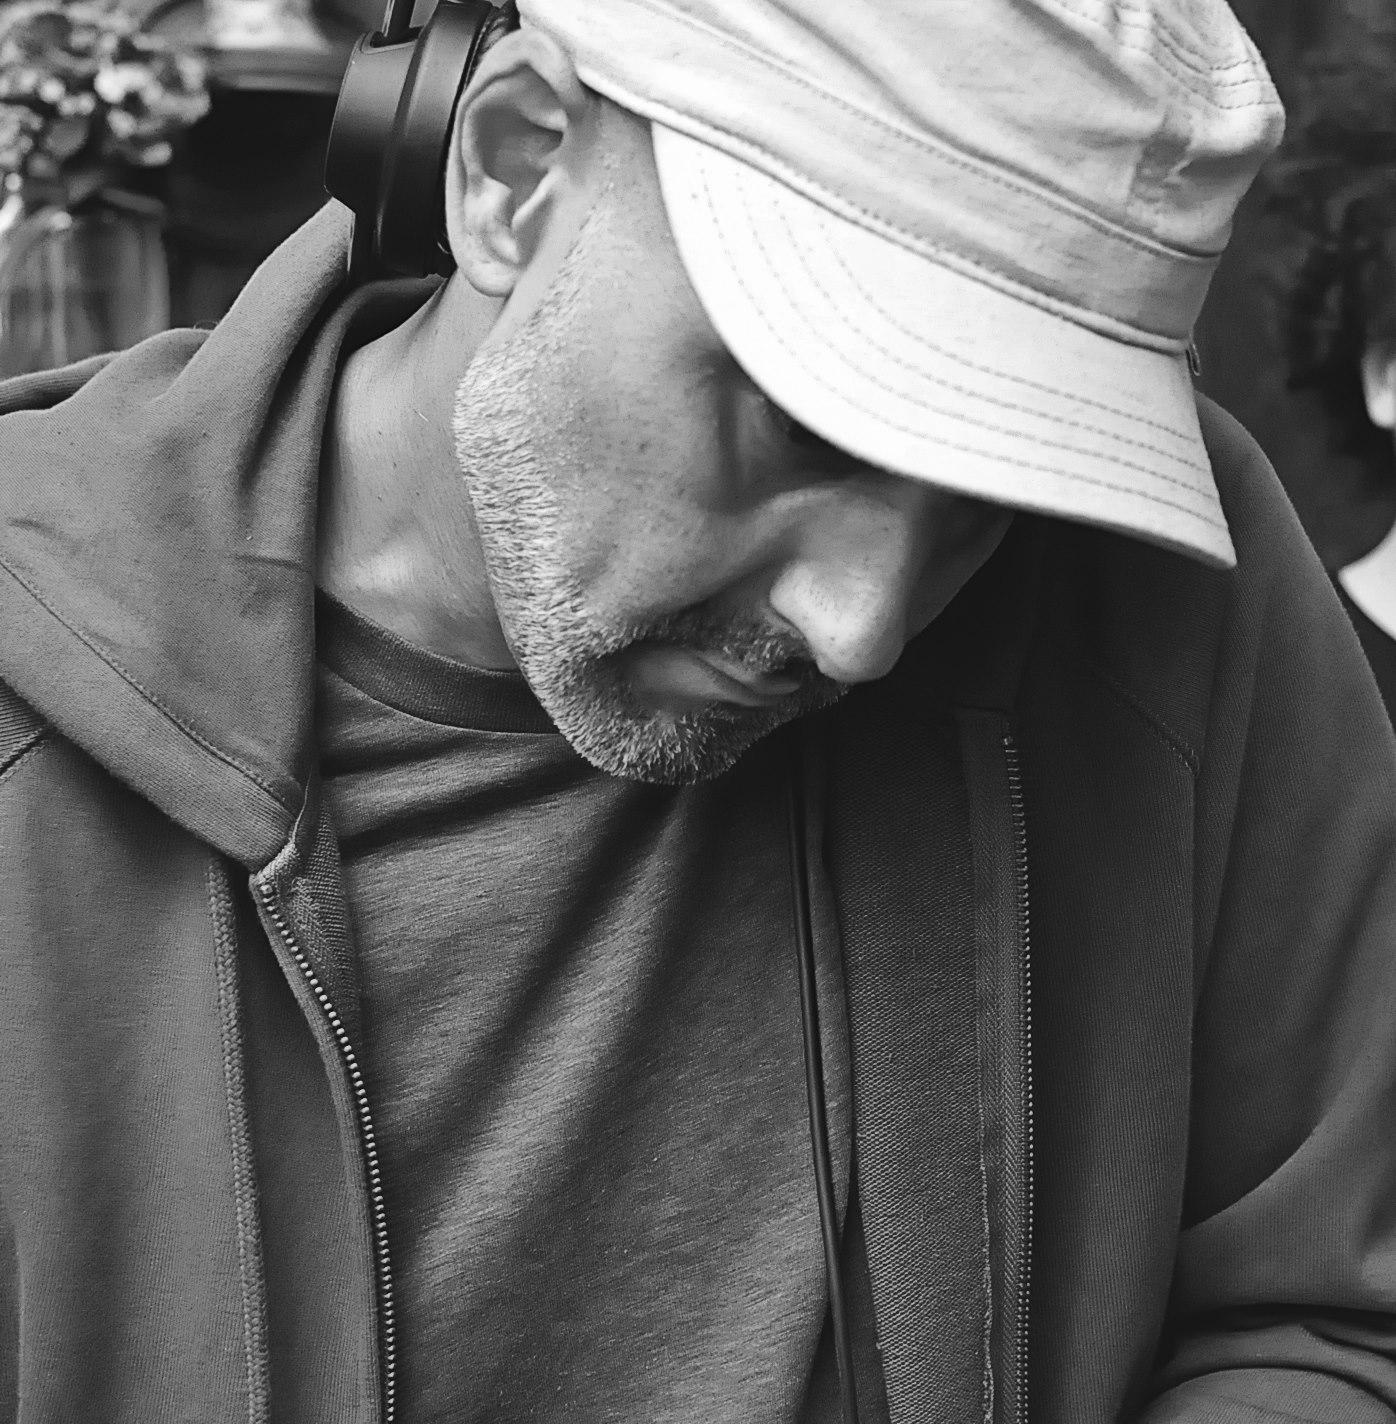 Craig Smith (6th Borough Project)